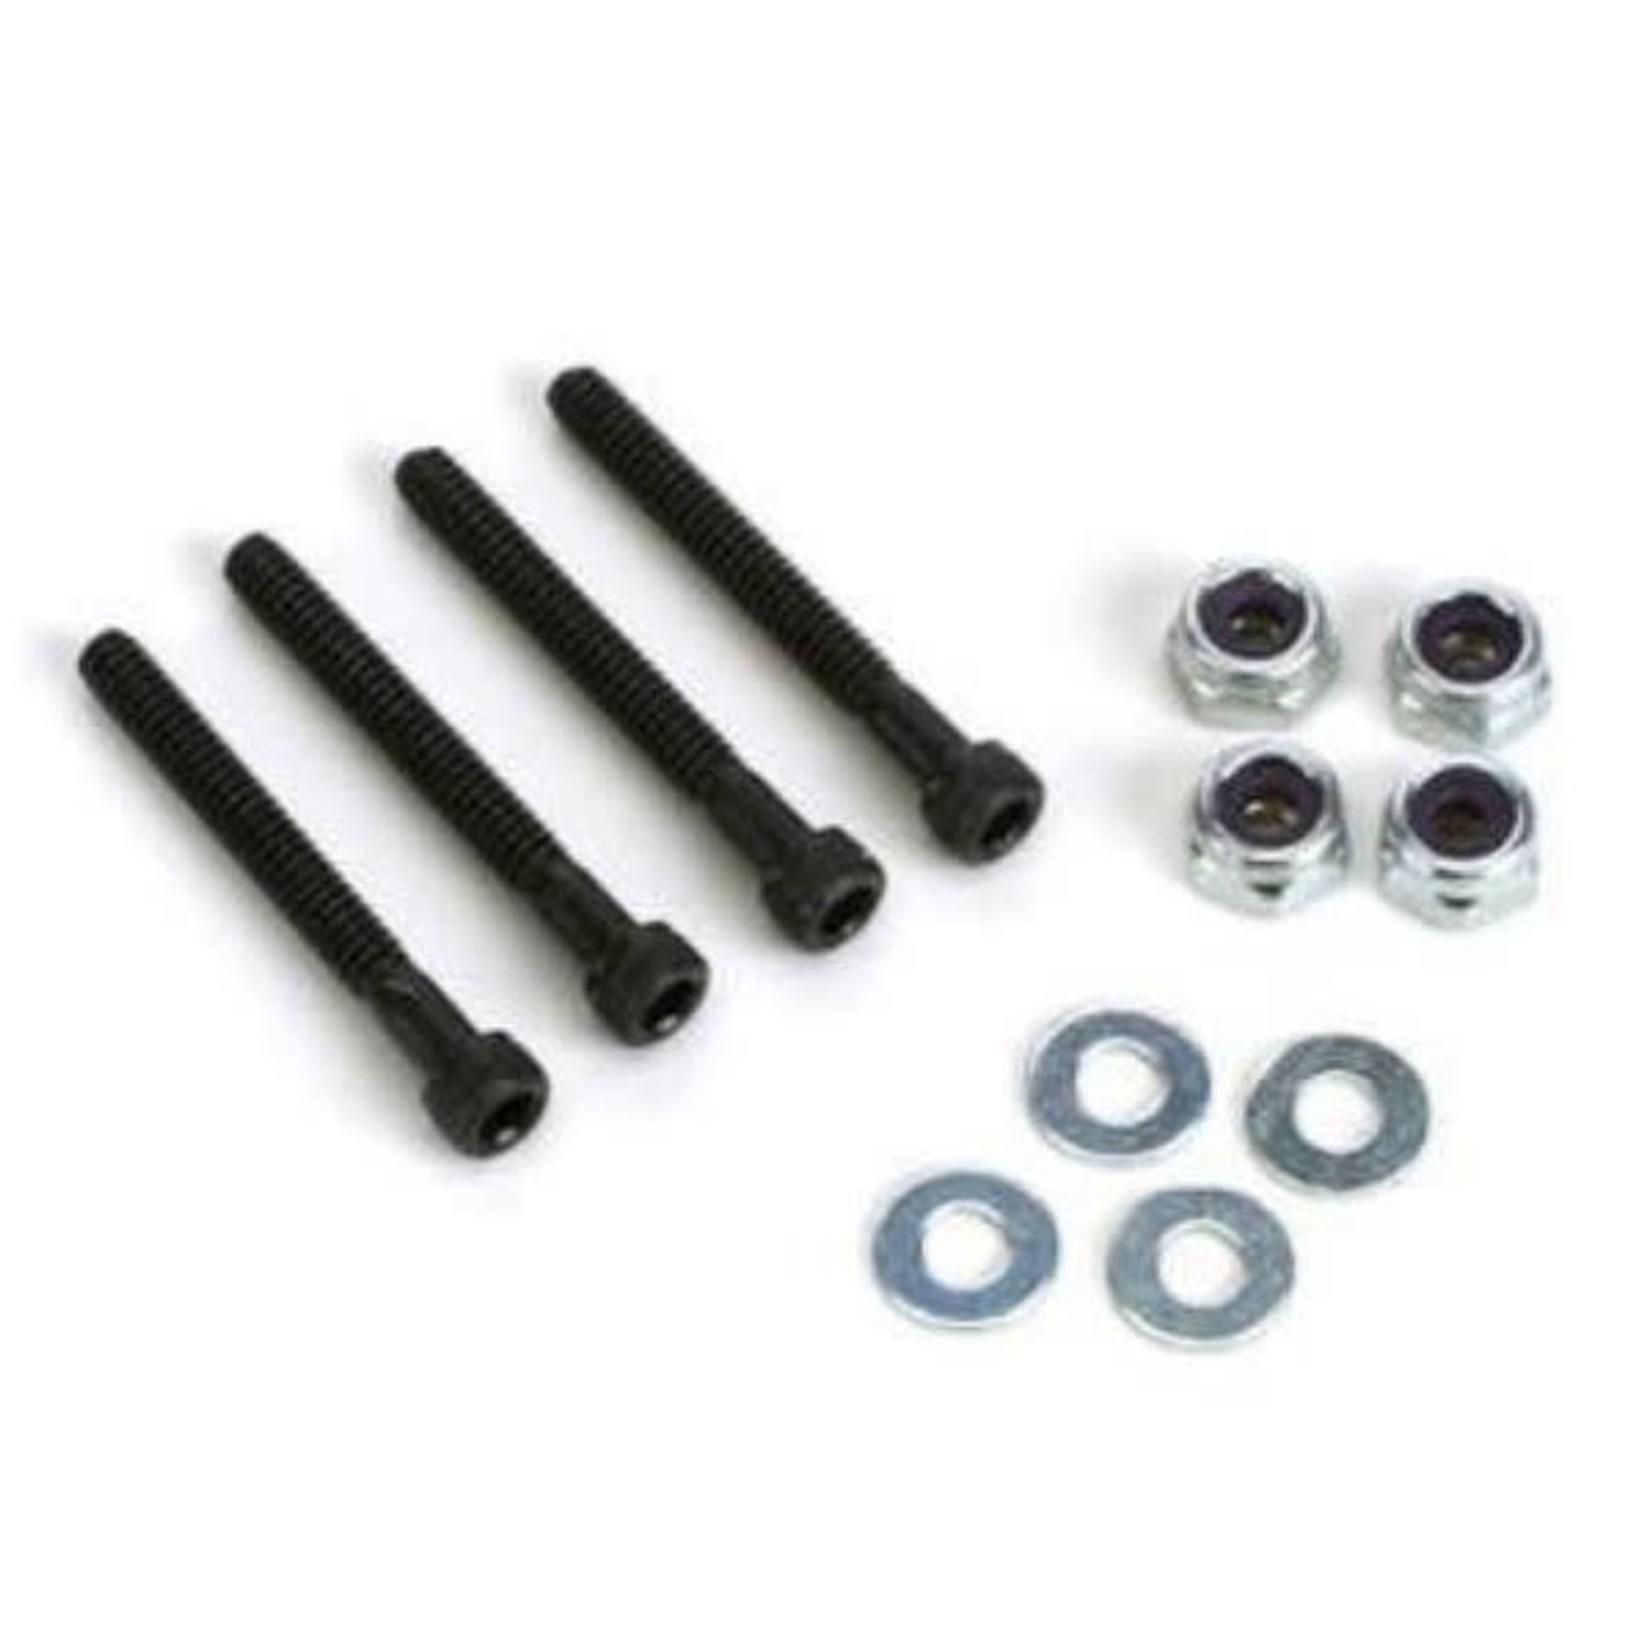 Dubro DUB179 Dubro Socket Heavy Duty Bolts & Lock Nut 6-32 x 1